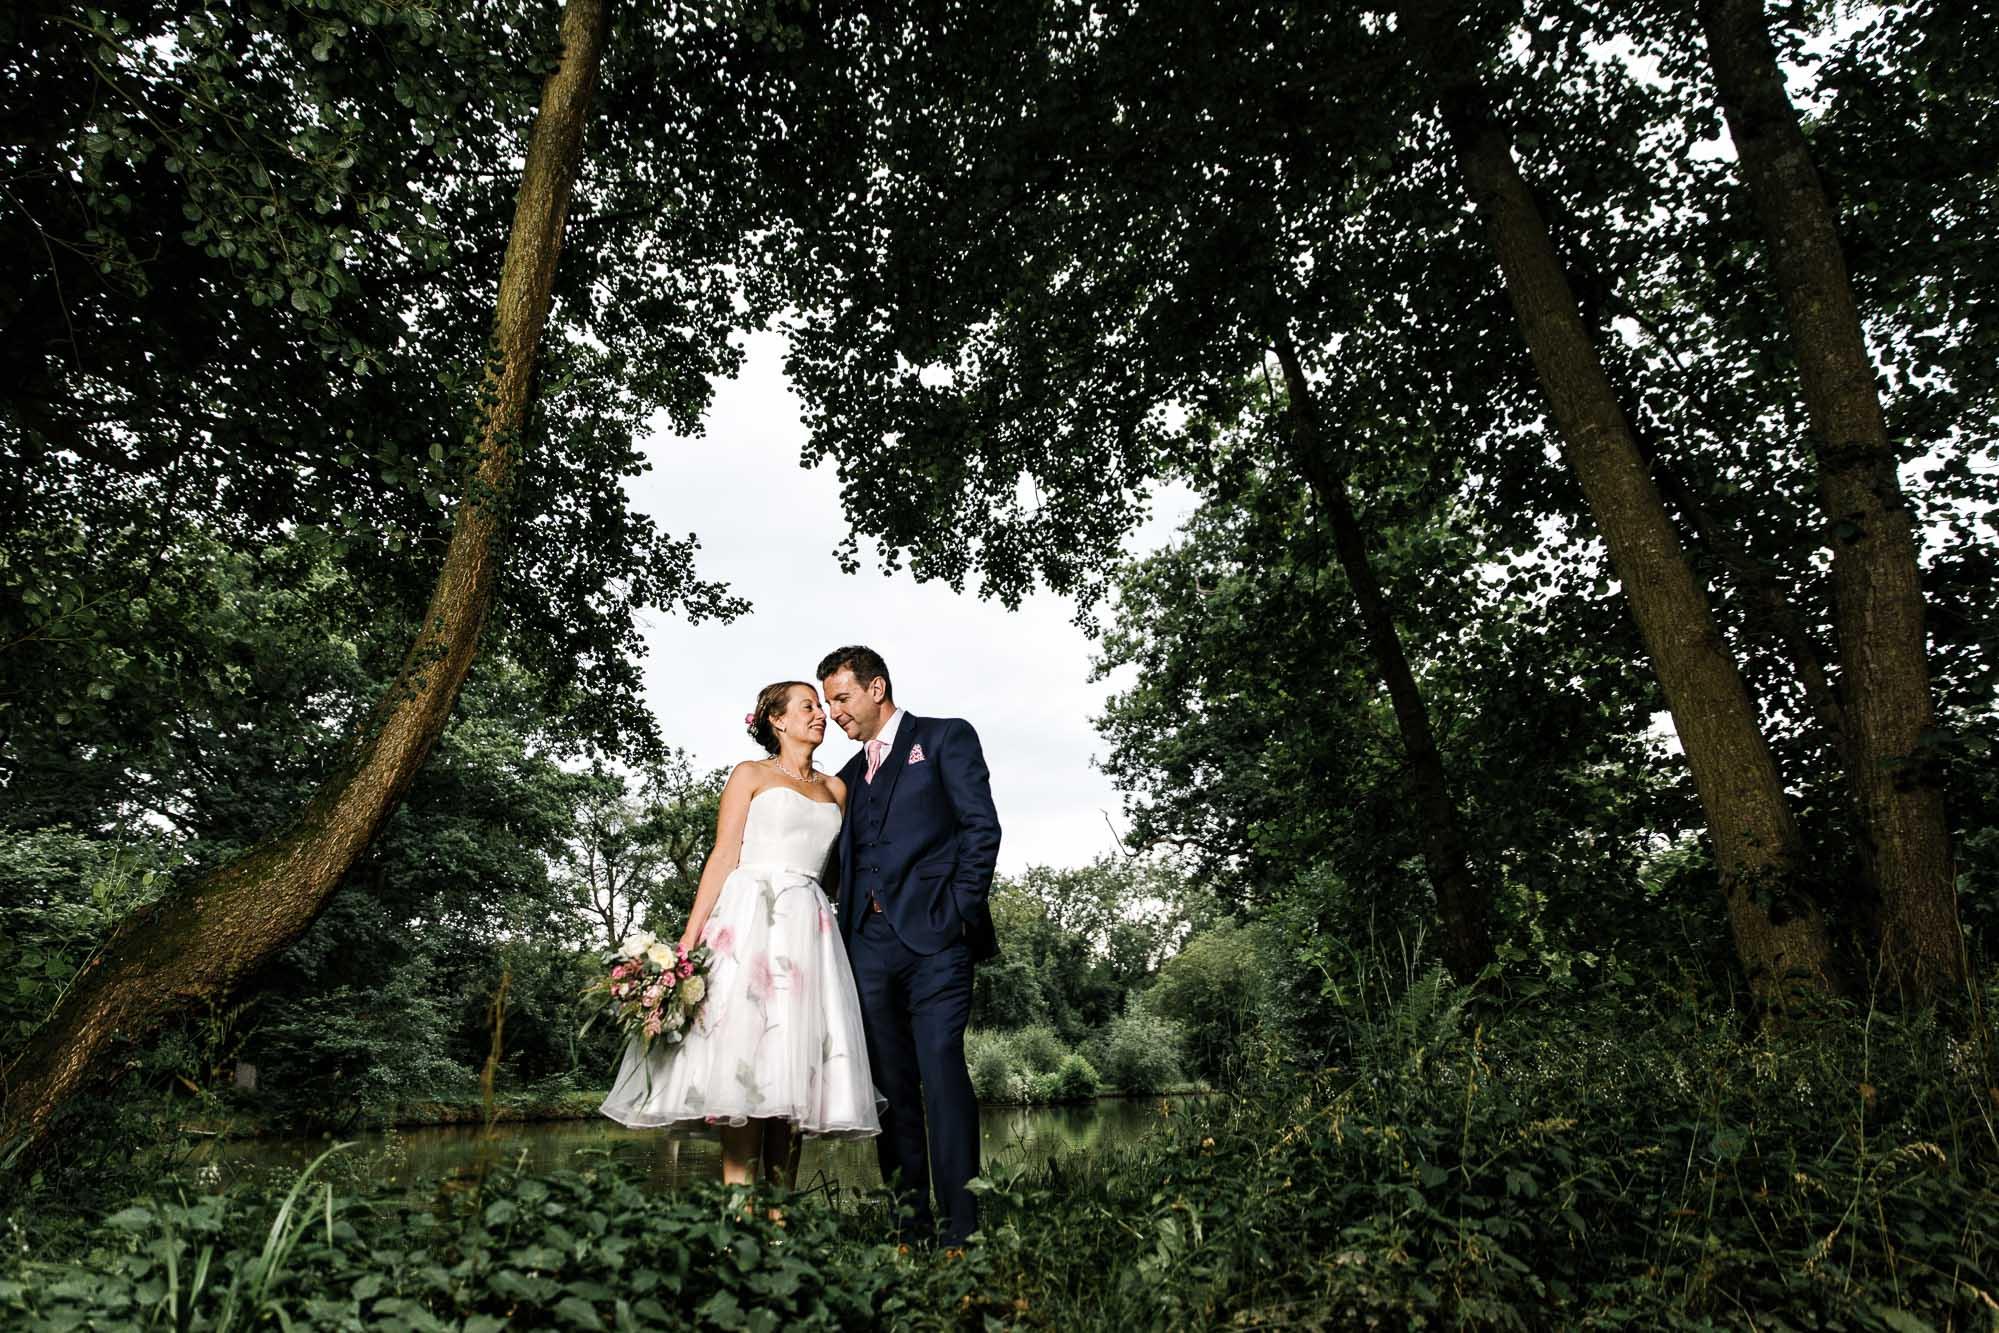 Lythe Hill Hotel Wedding Photography - Gavin and Fiona 19